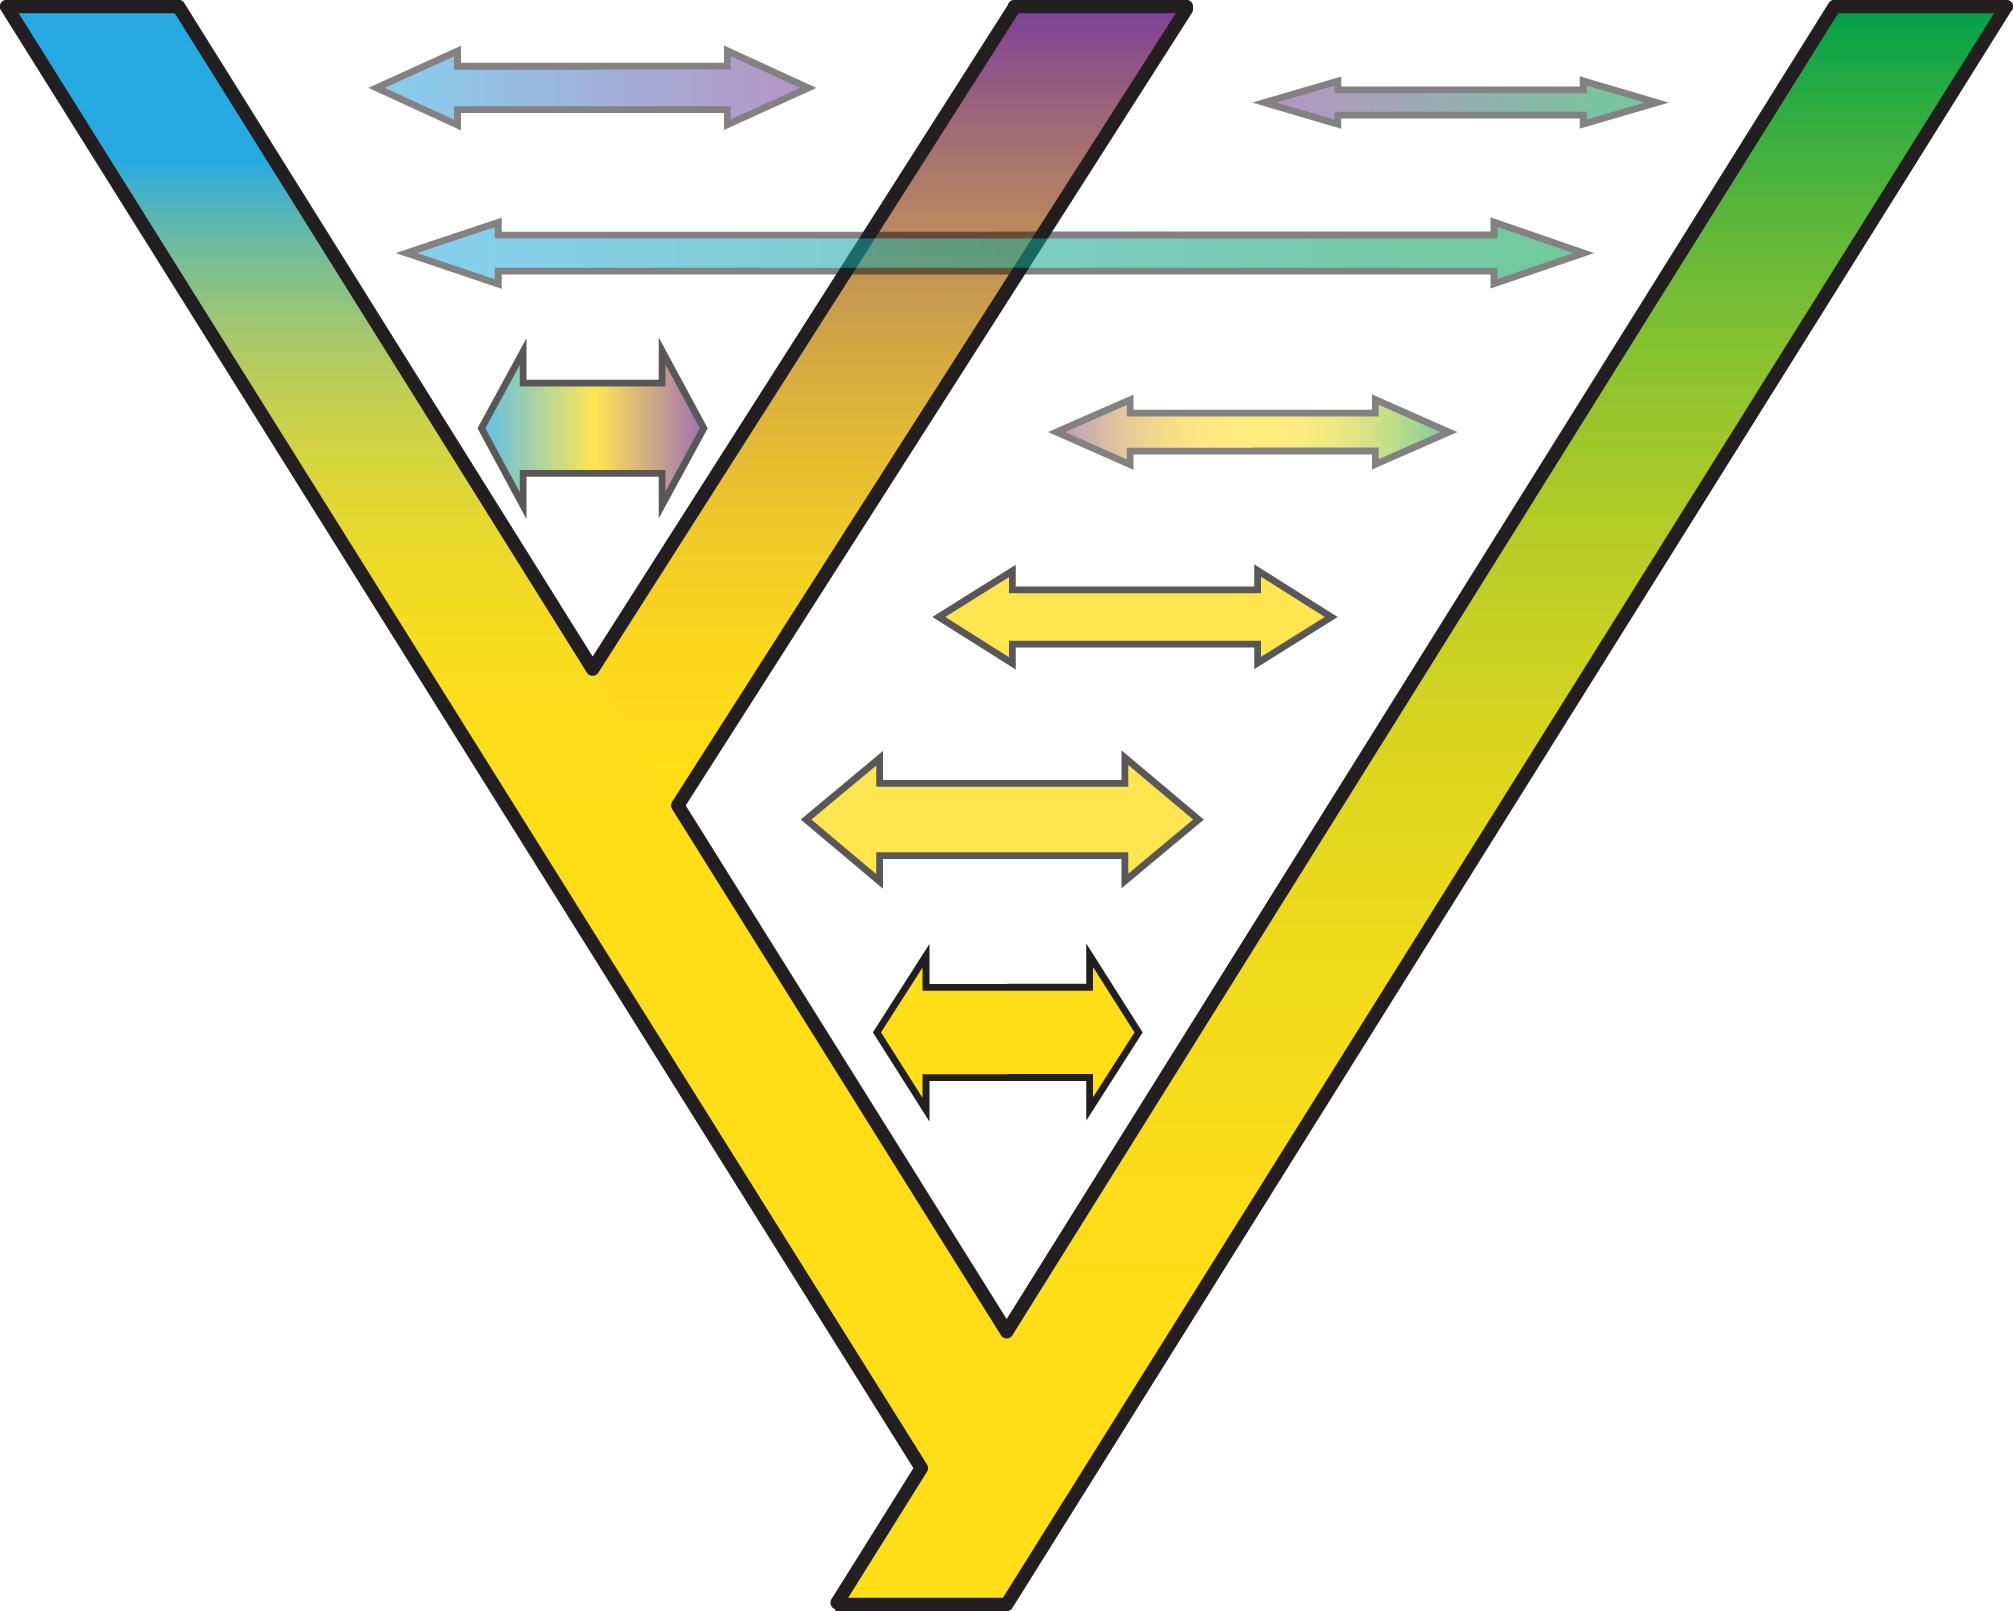 Embracing heterogeneity: coalescing the Tree of Life and the future